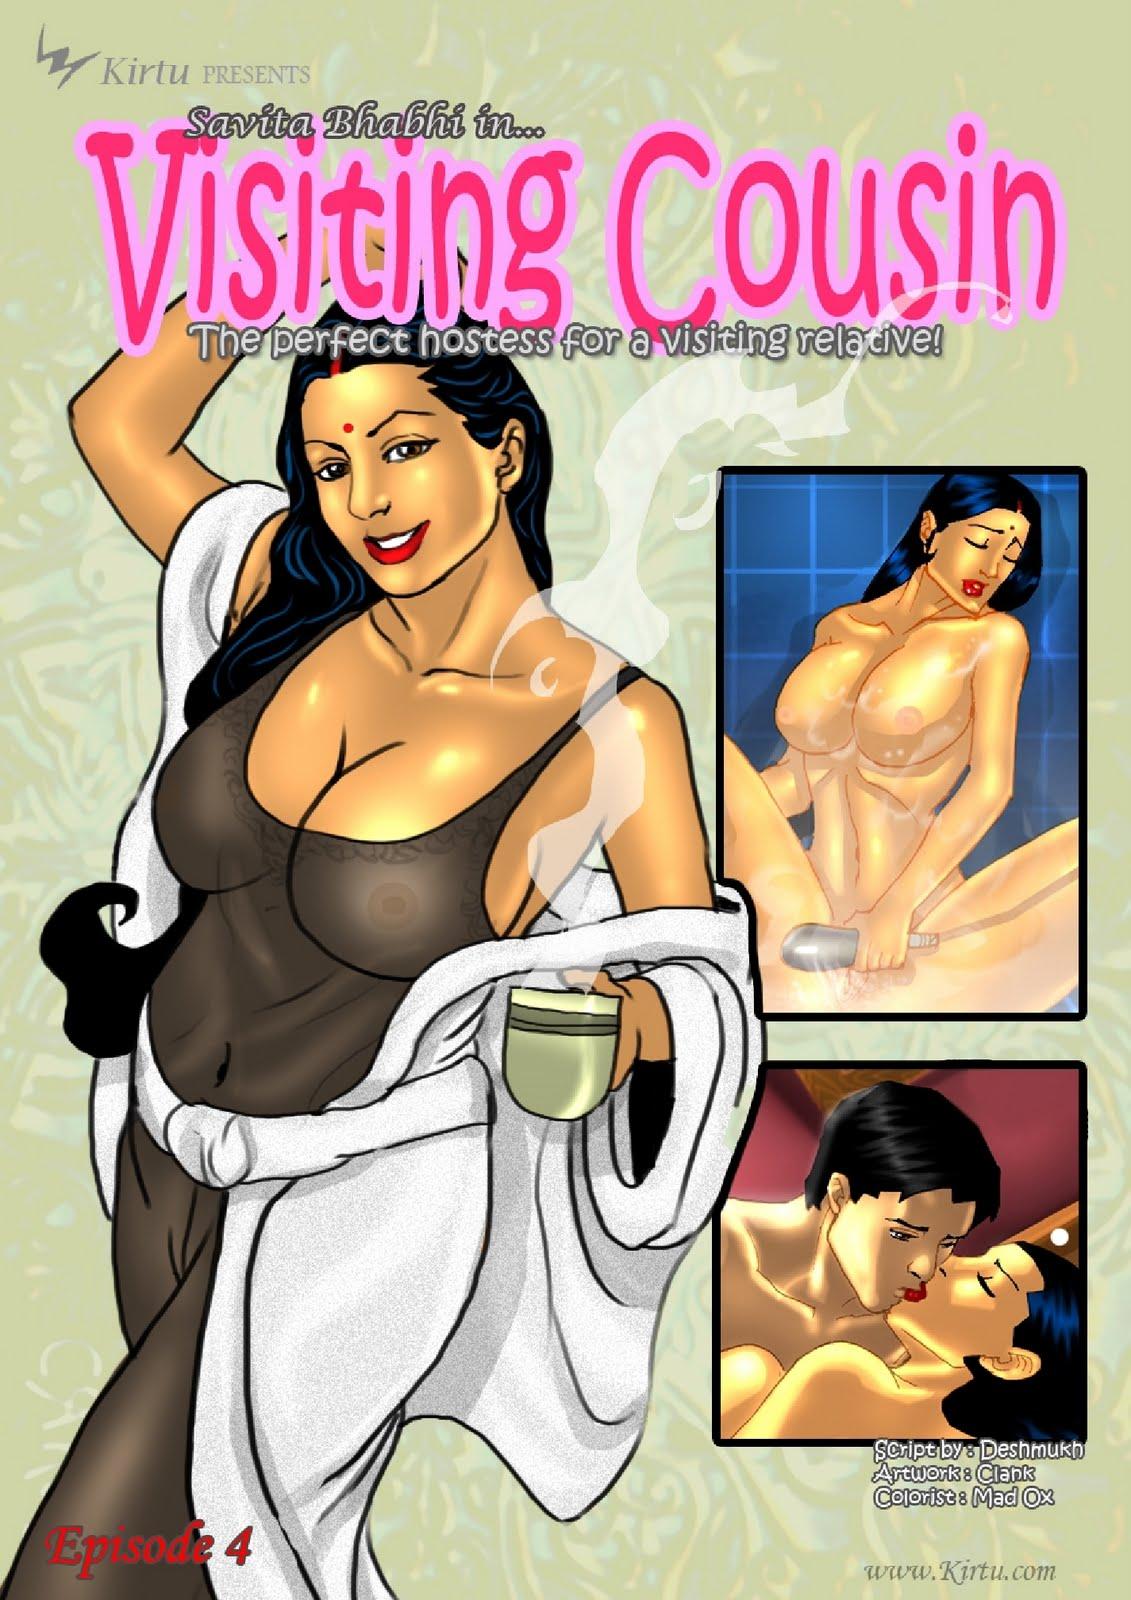 Savita Bhabhi(English) Episode 4 Mediafire Compressed XXX Movies Mediafire ...